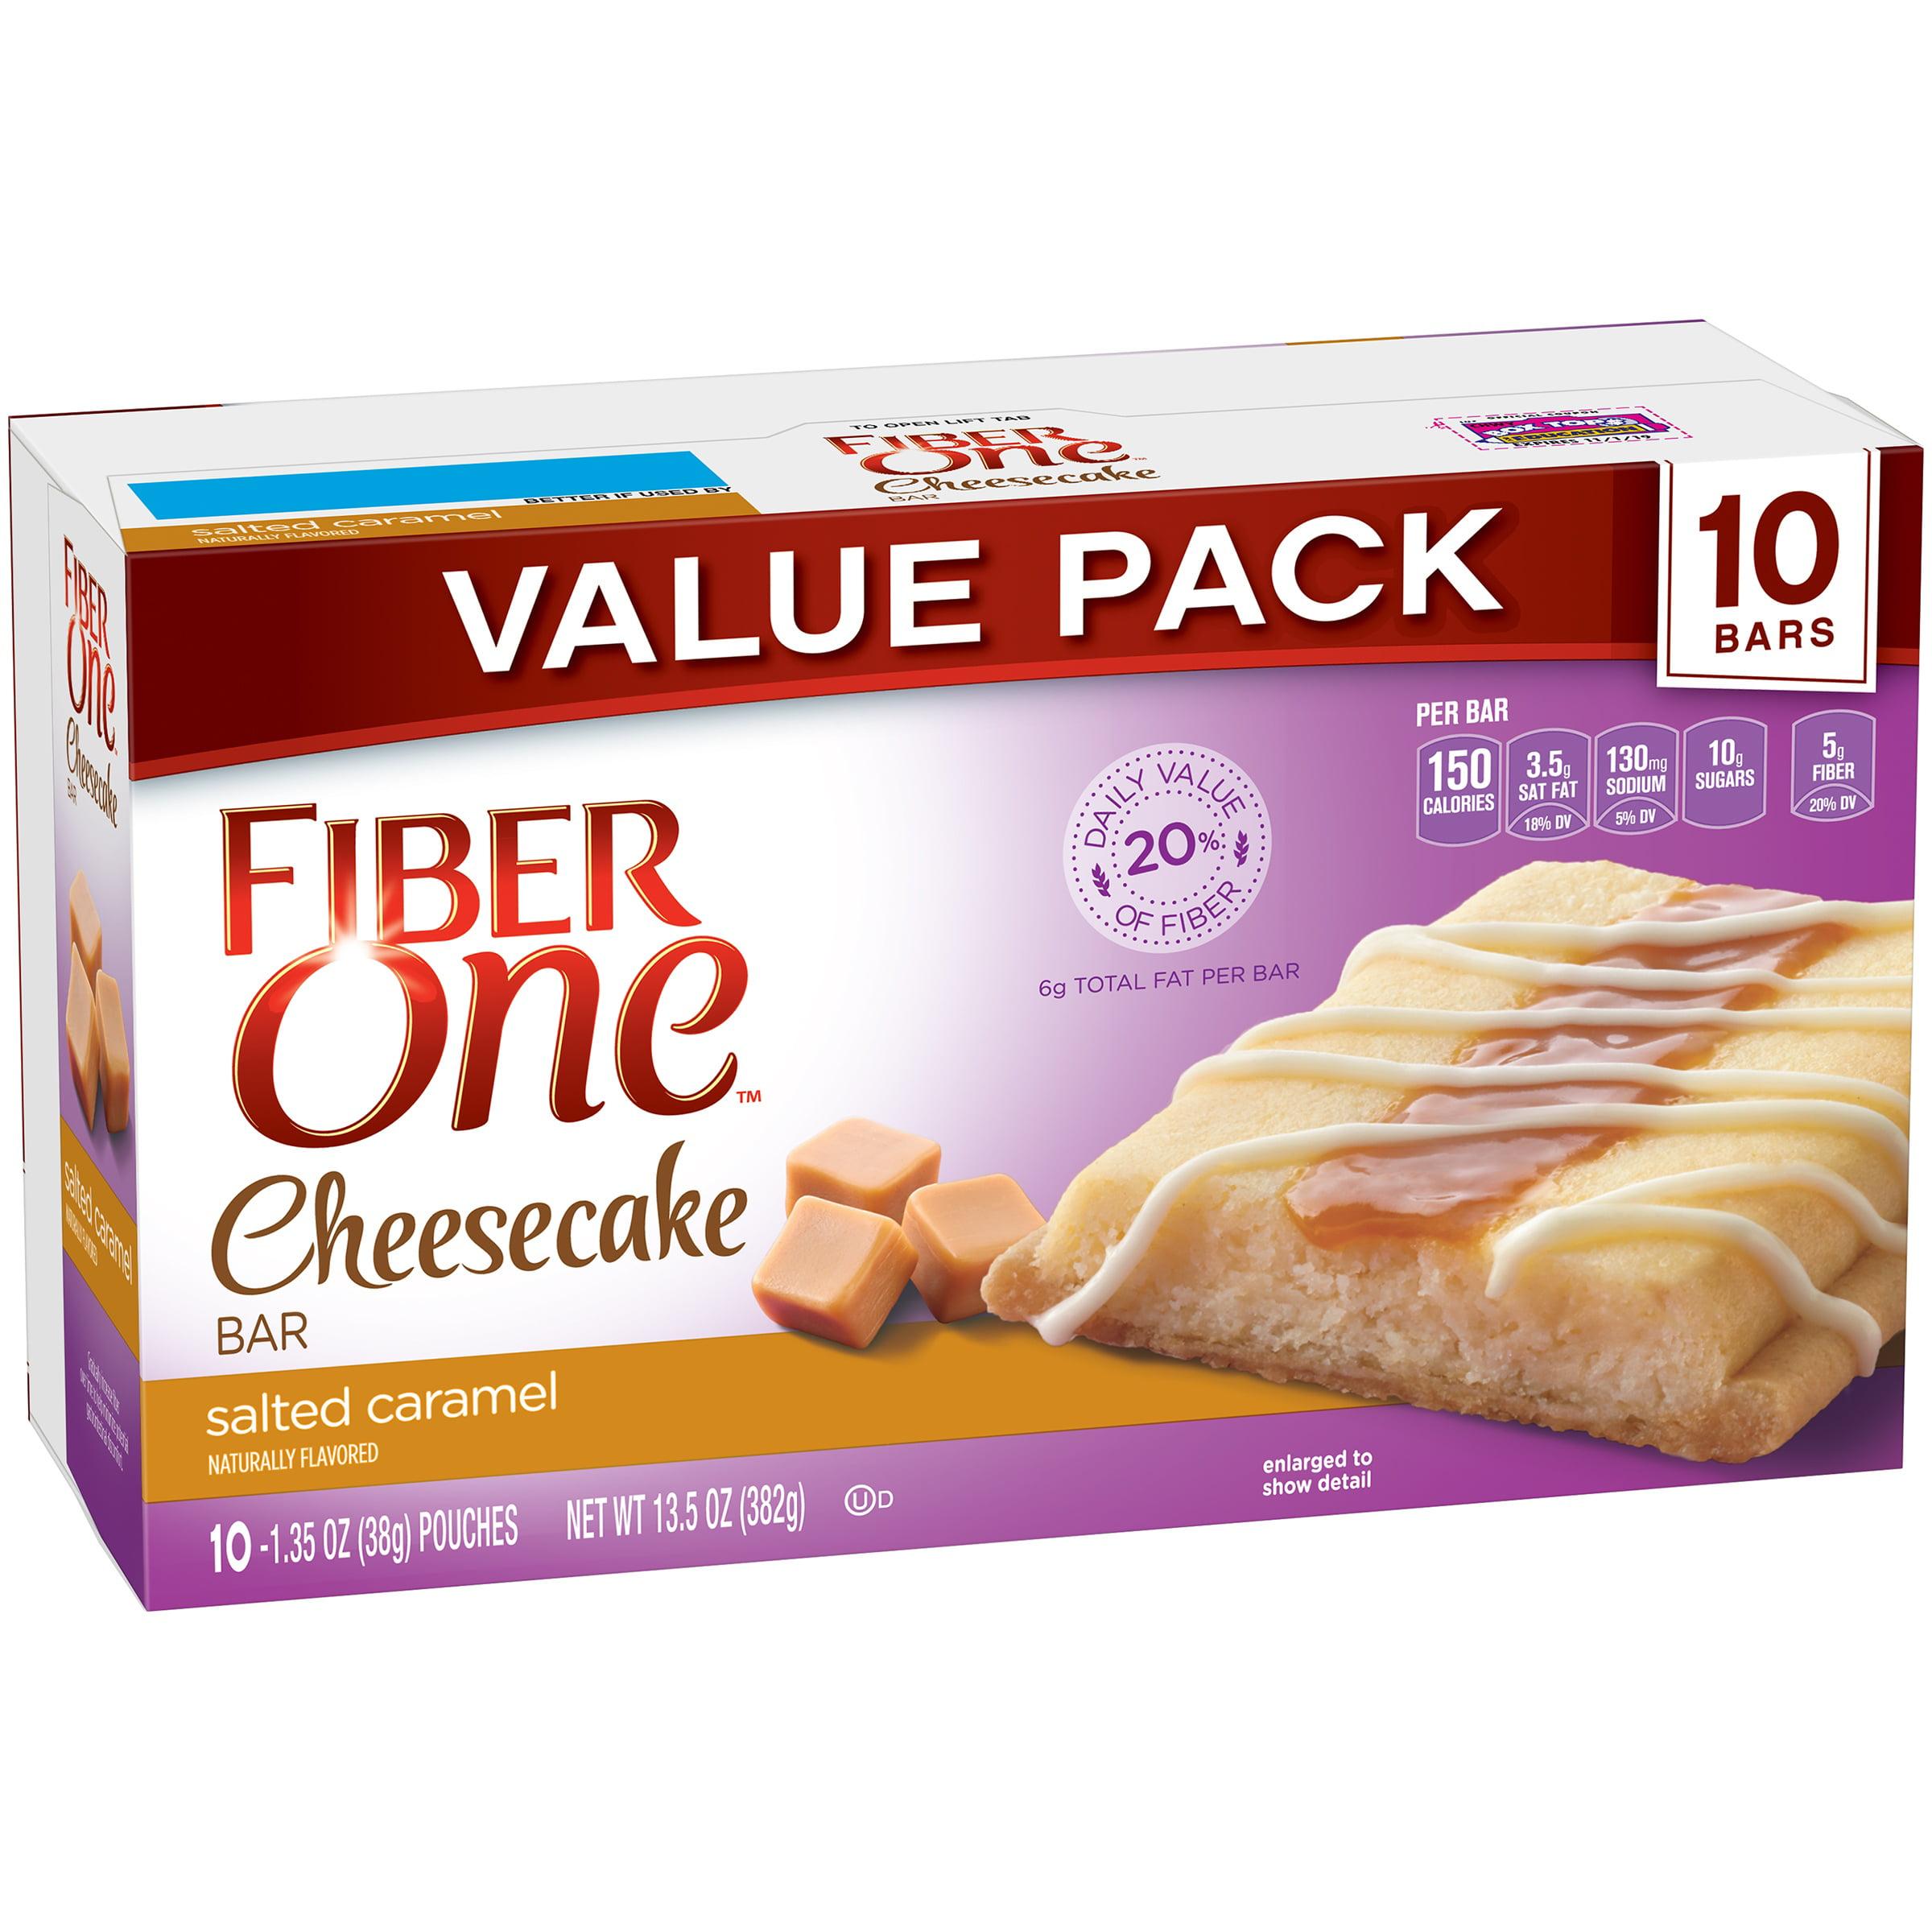 Fiber One Cheesecake Bar Salted Caramel 10 1.35 oz Bars by General Mills Sales, Inc.